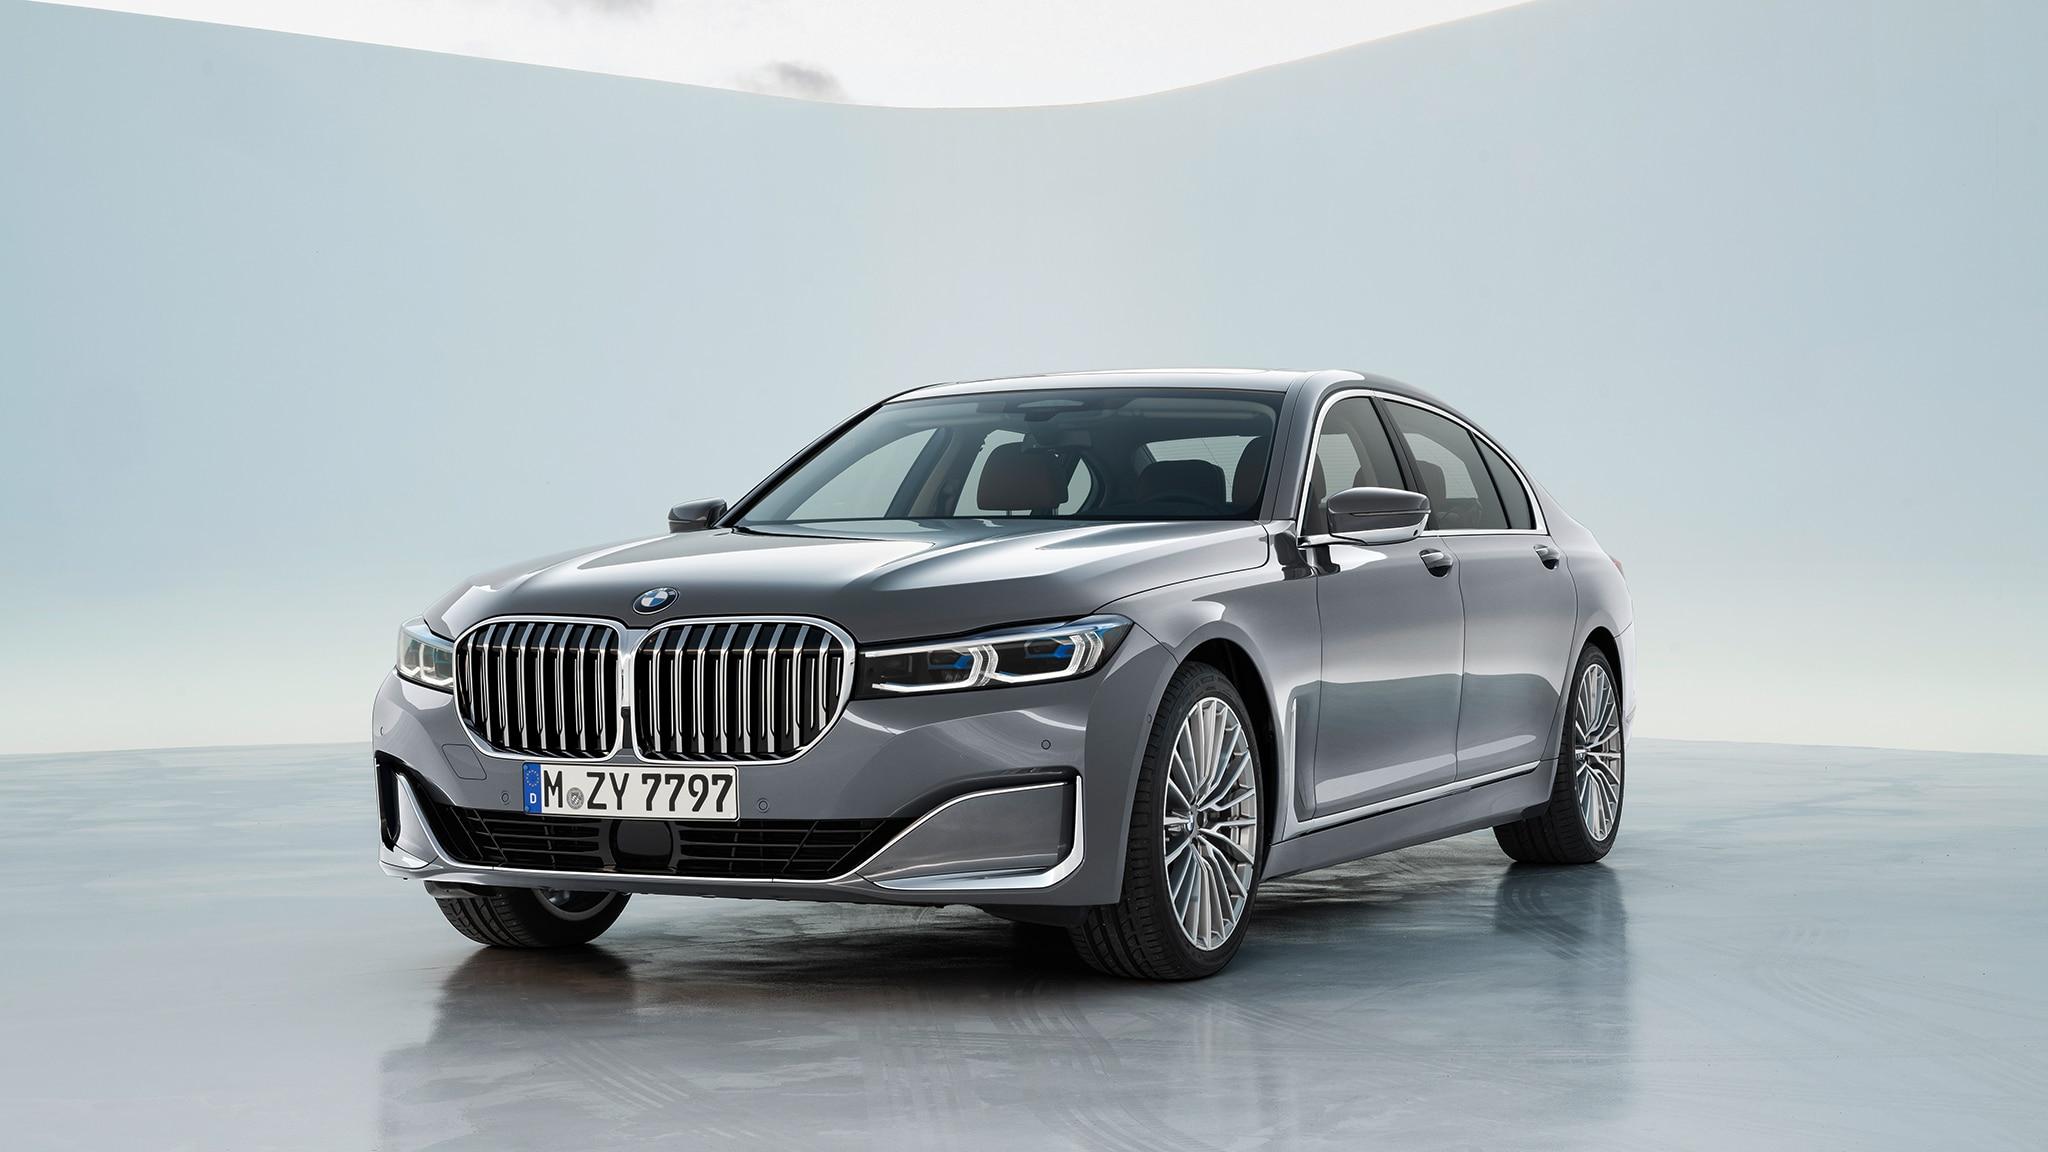 2020 BMW 7 Series 56